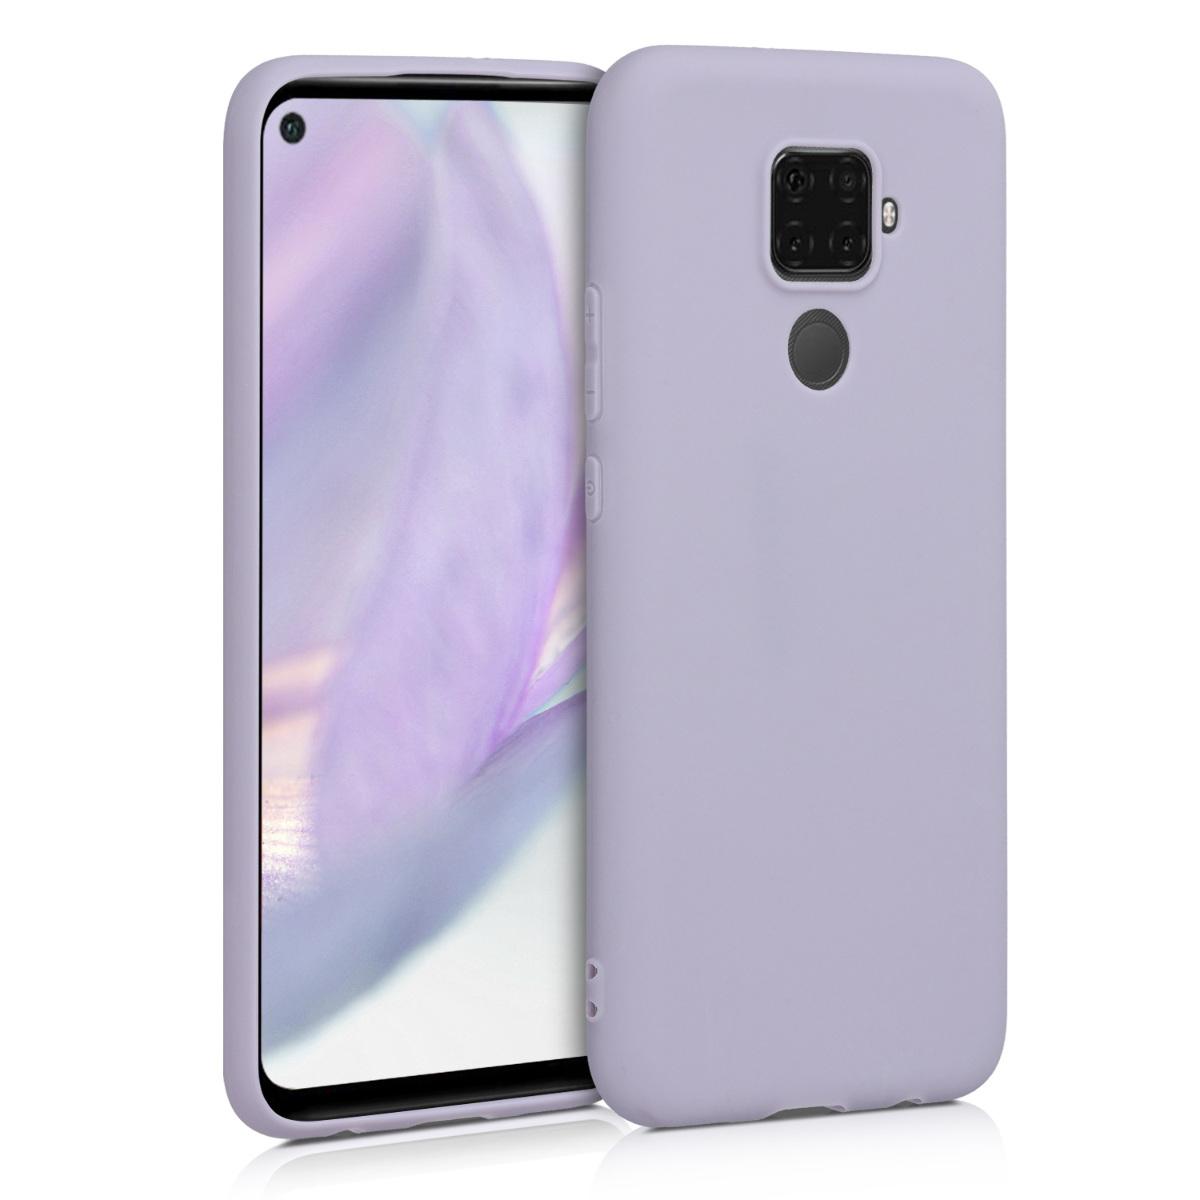 KW Θήκη Σιλικόνης Huawei Mate 30 Lite - Lavender (50153.108)